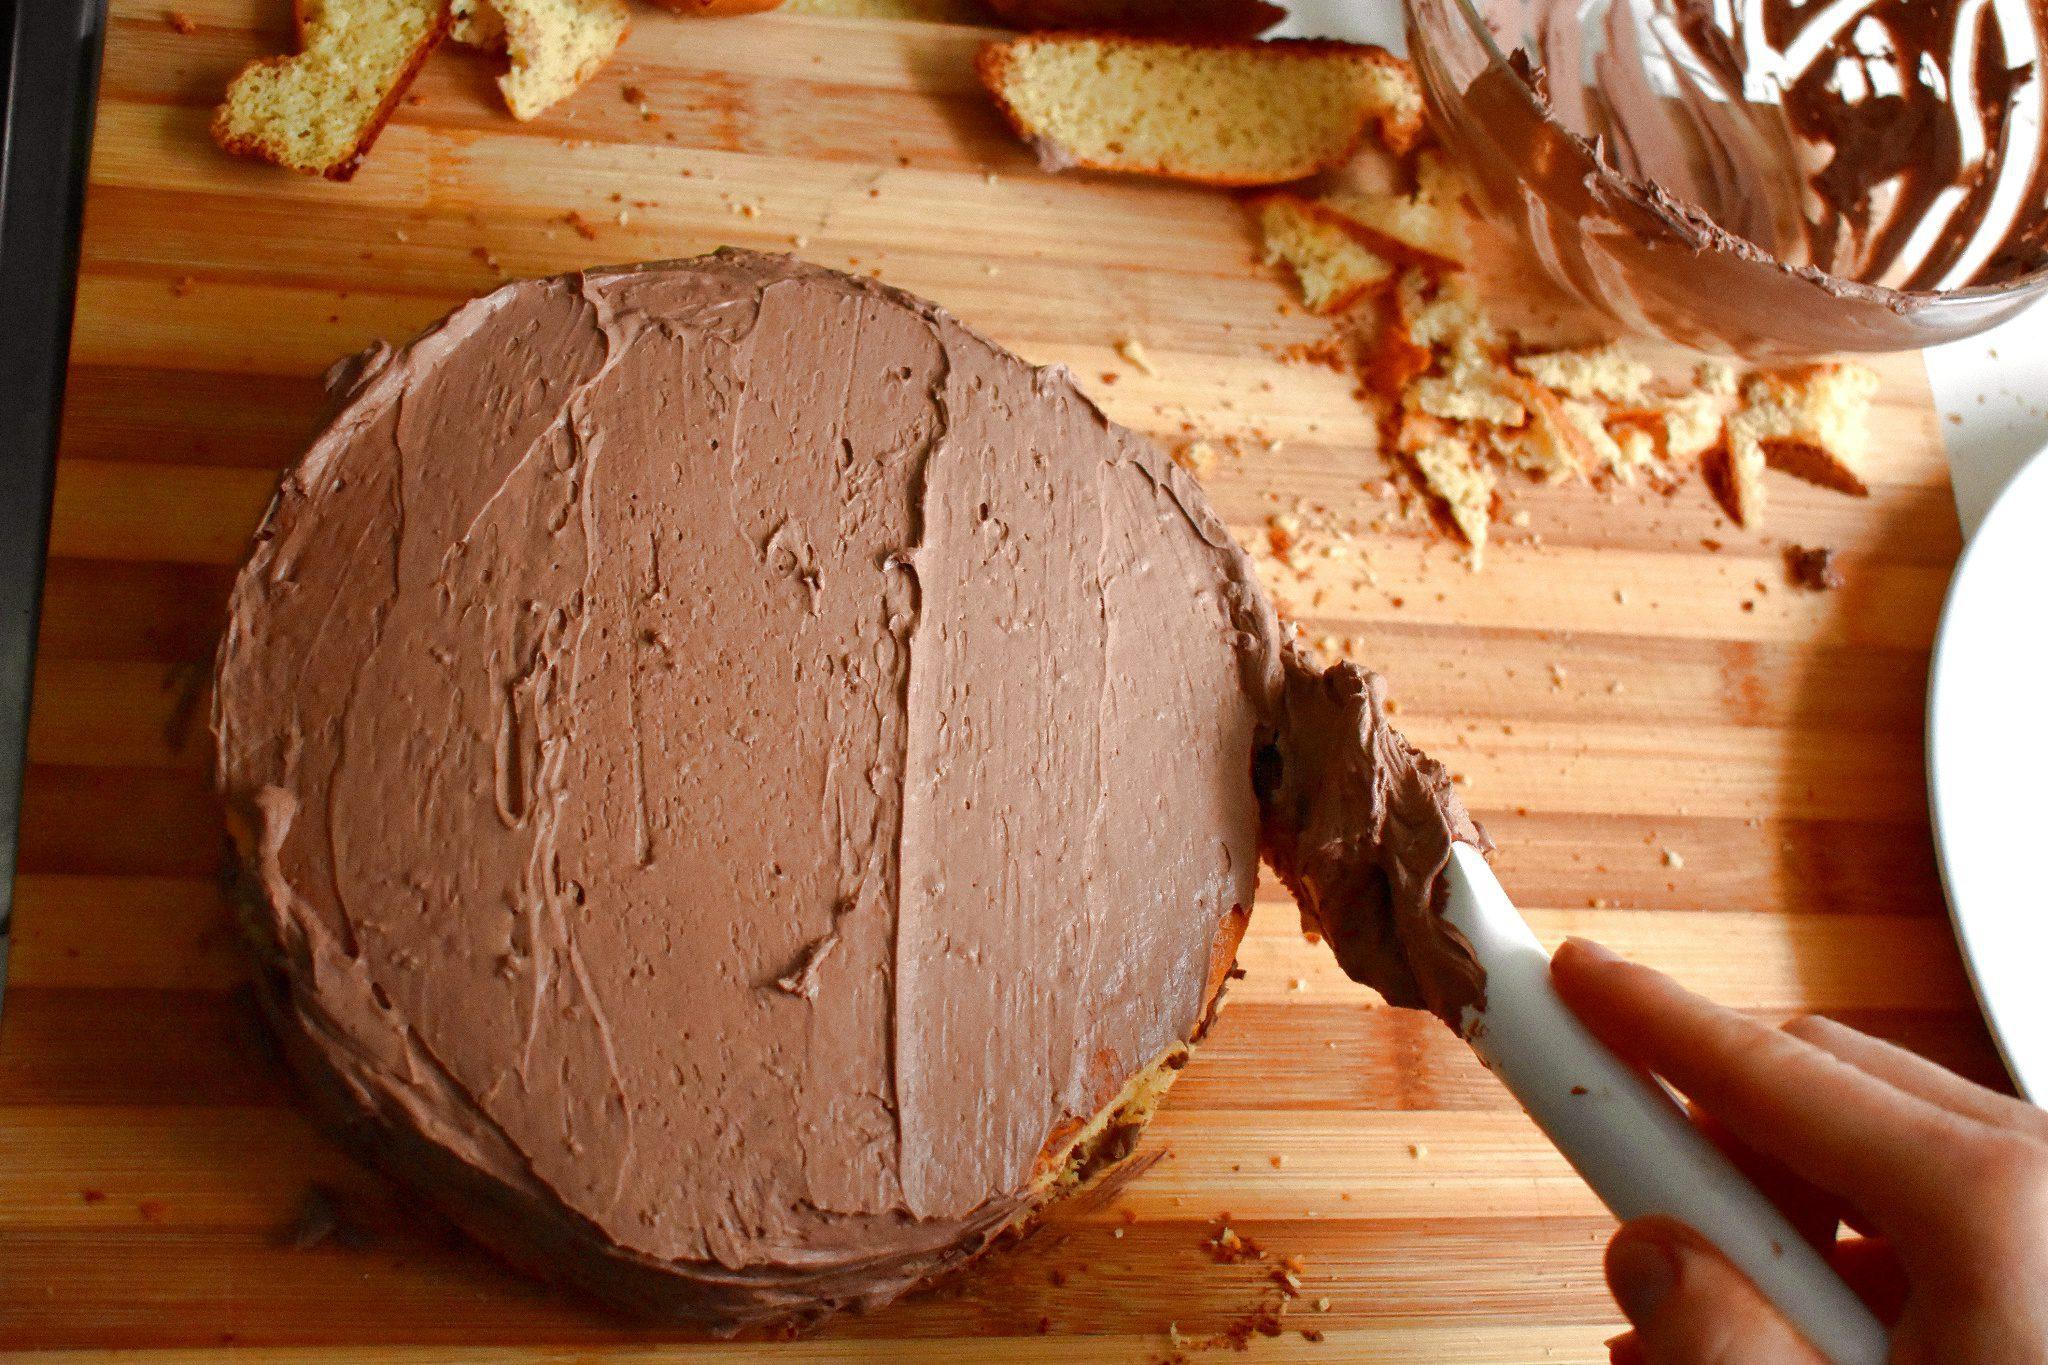 Gluten-free-almond-cake-process-7-SunCakeMom